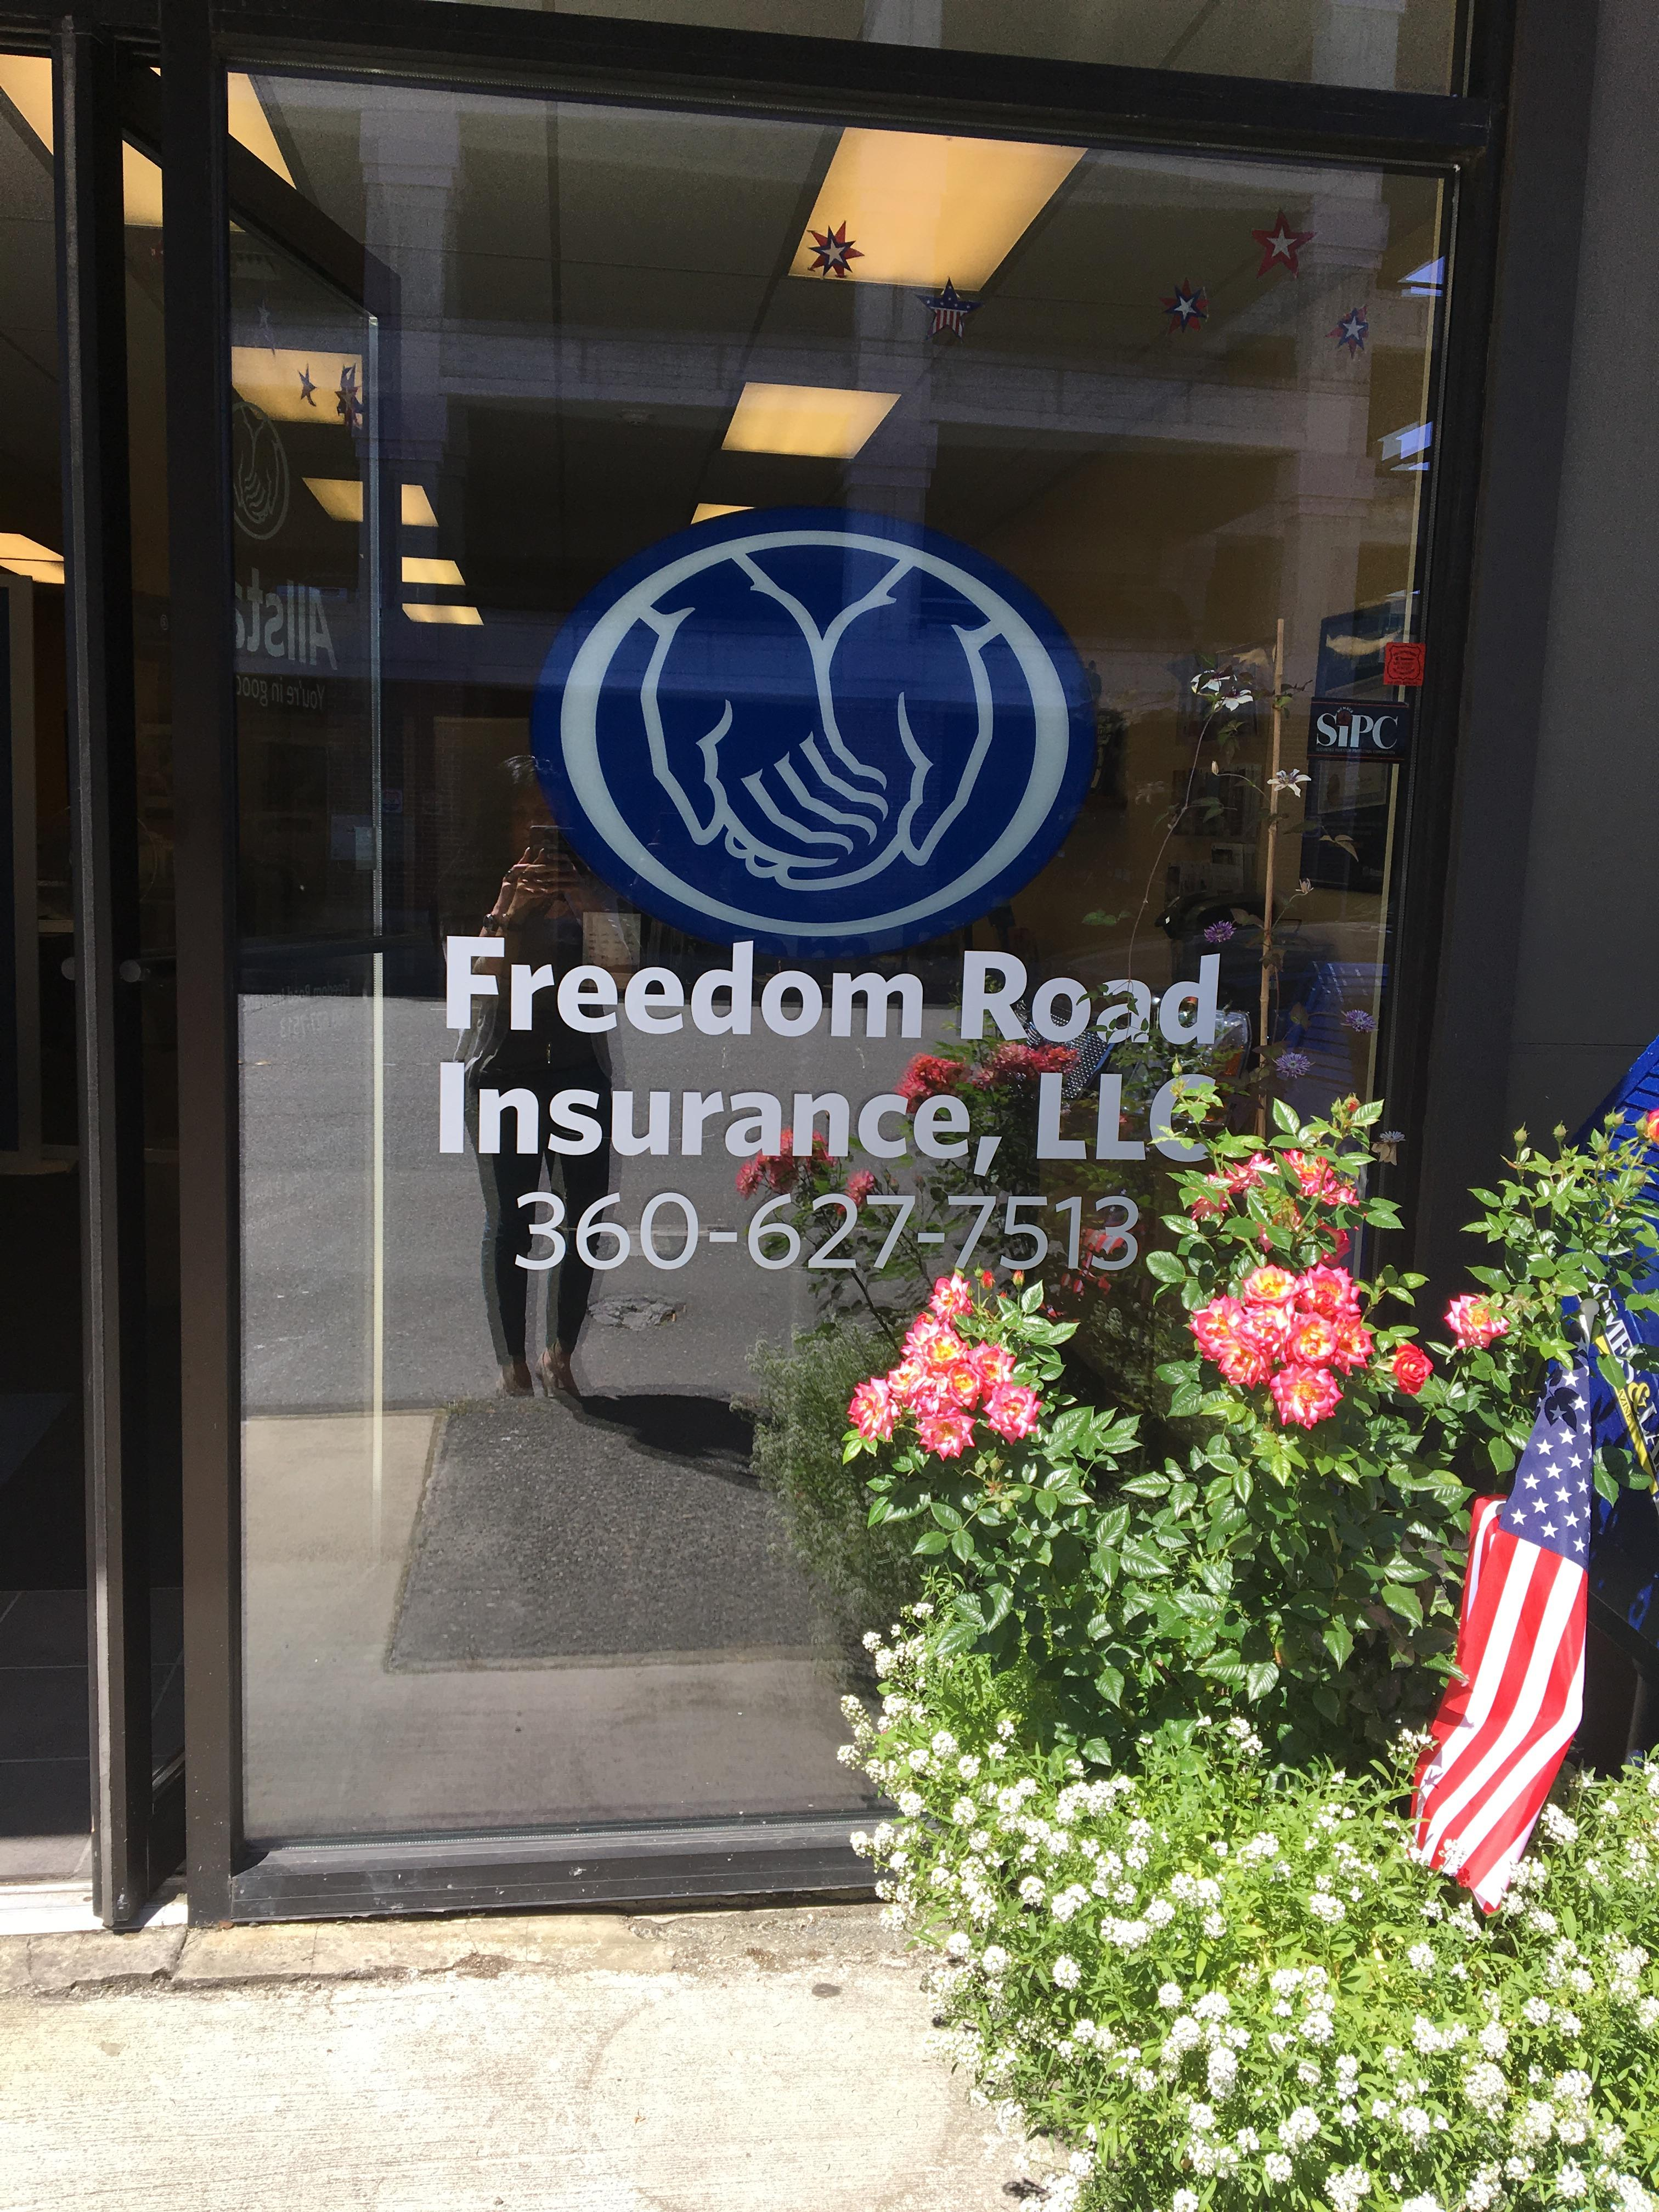 Freedom Road Insurance, LLC: Allstate Insurance image 4